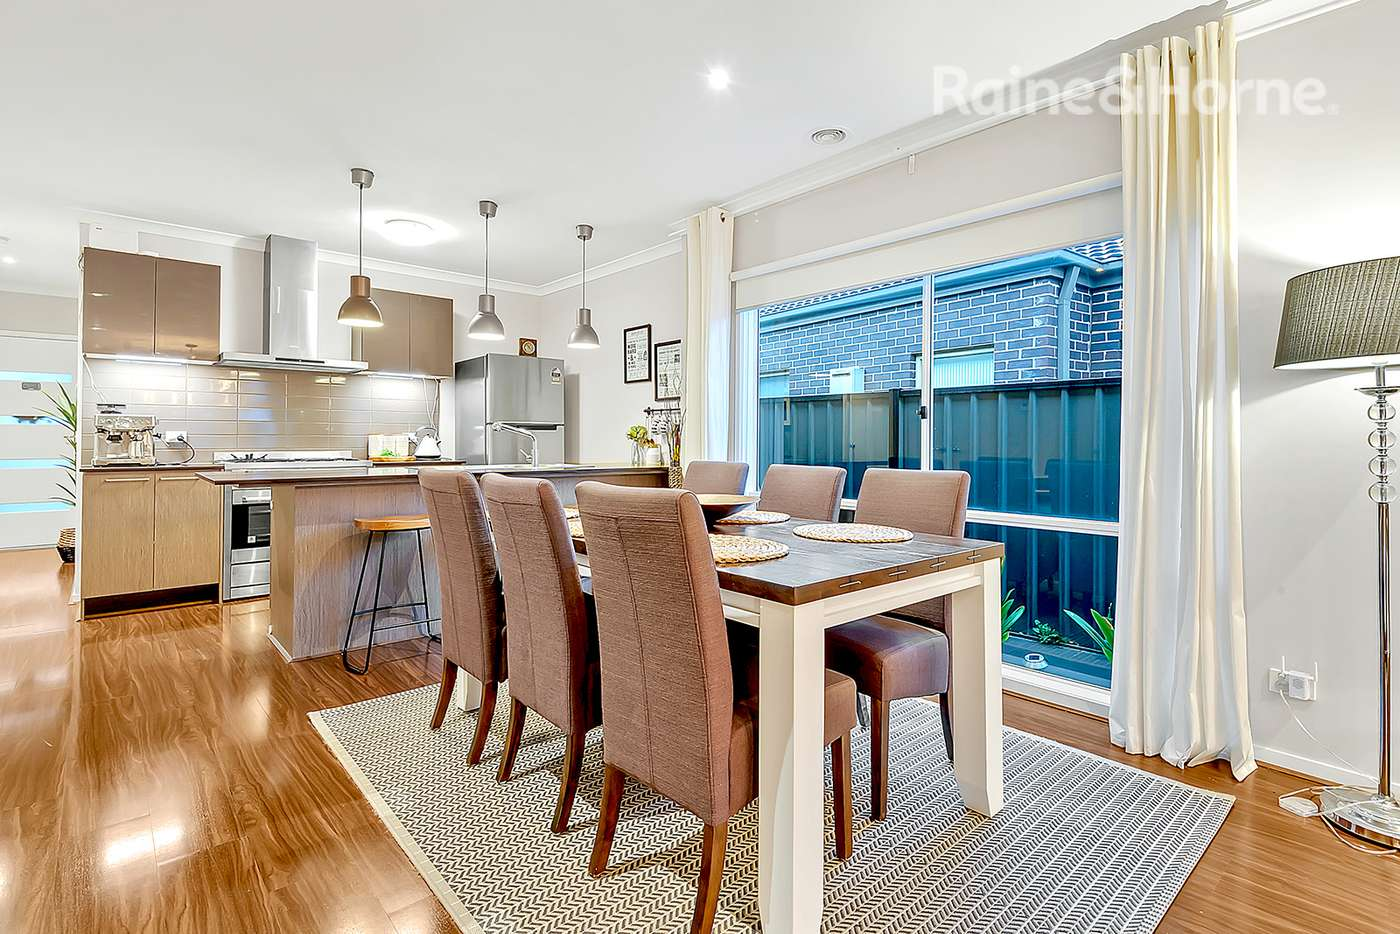 Sixth view of Homely house listing, 6 Powell Street, Craigieburn VIC 3064